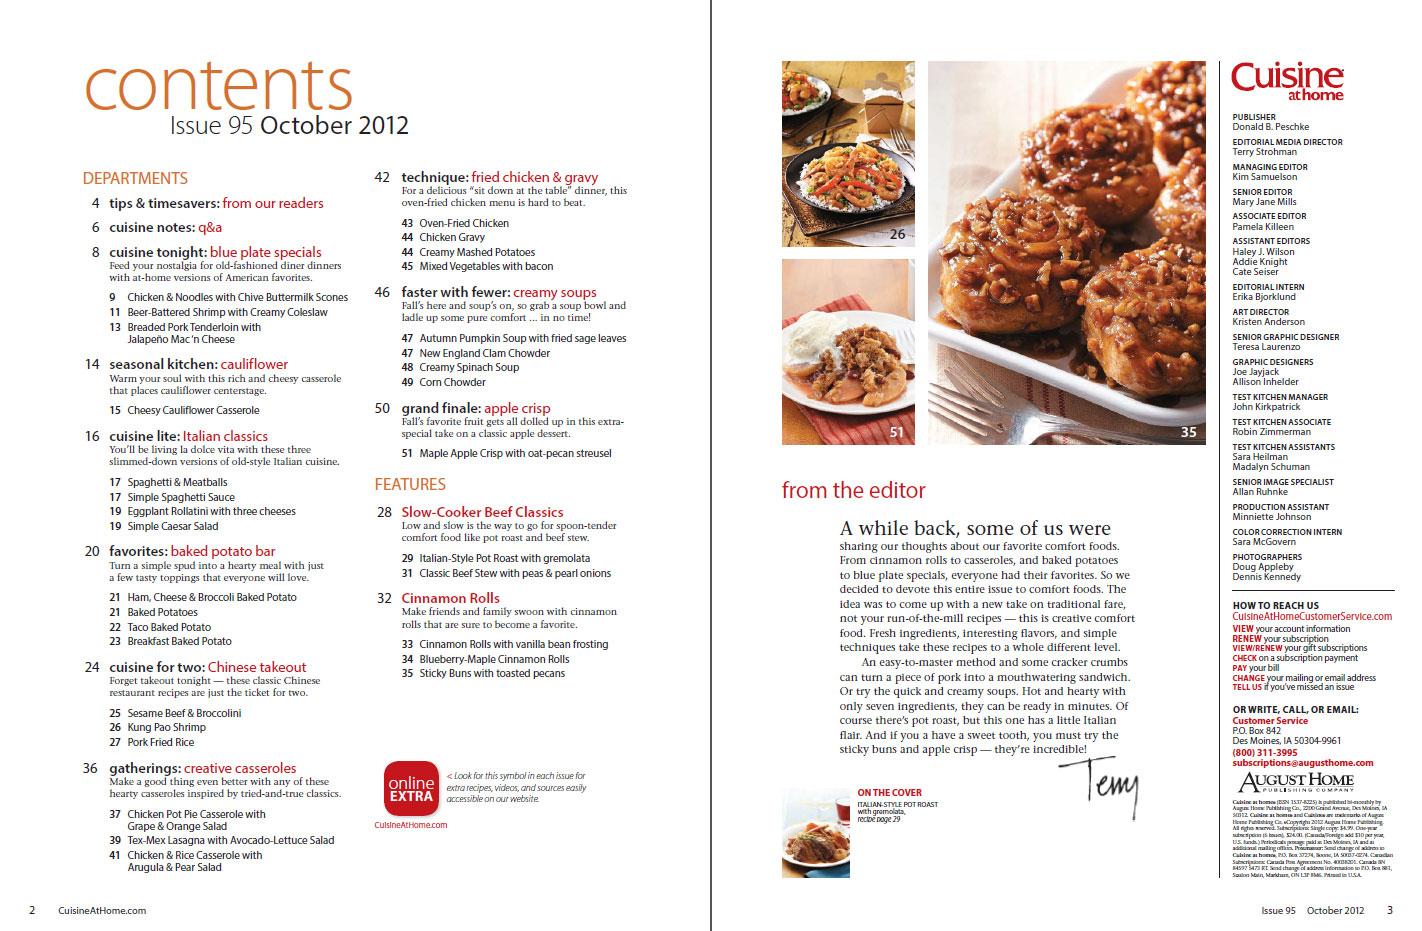 Cuisine Complete Top Knoxhult Cuisine Complte Ikea With Cuisine